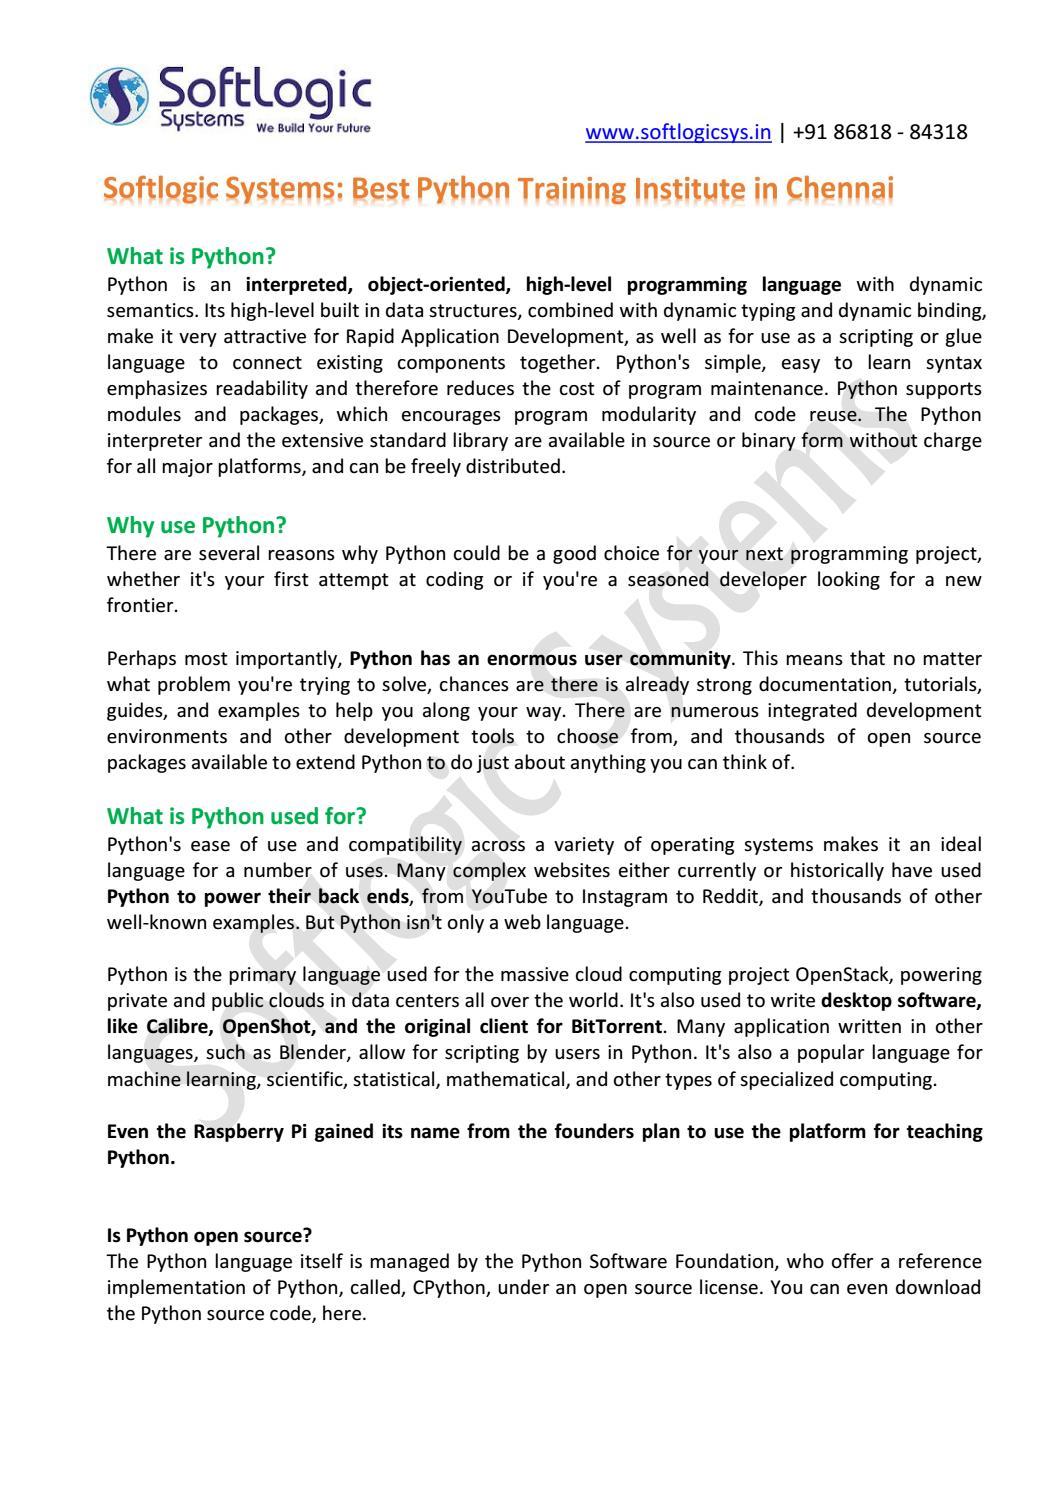 Softlogic Systems - Best Python Training Institute in